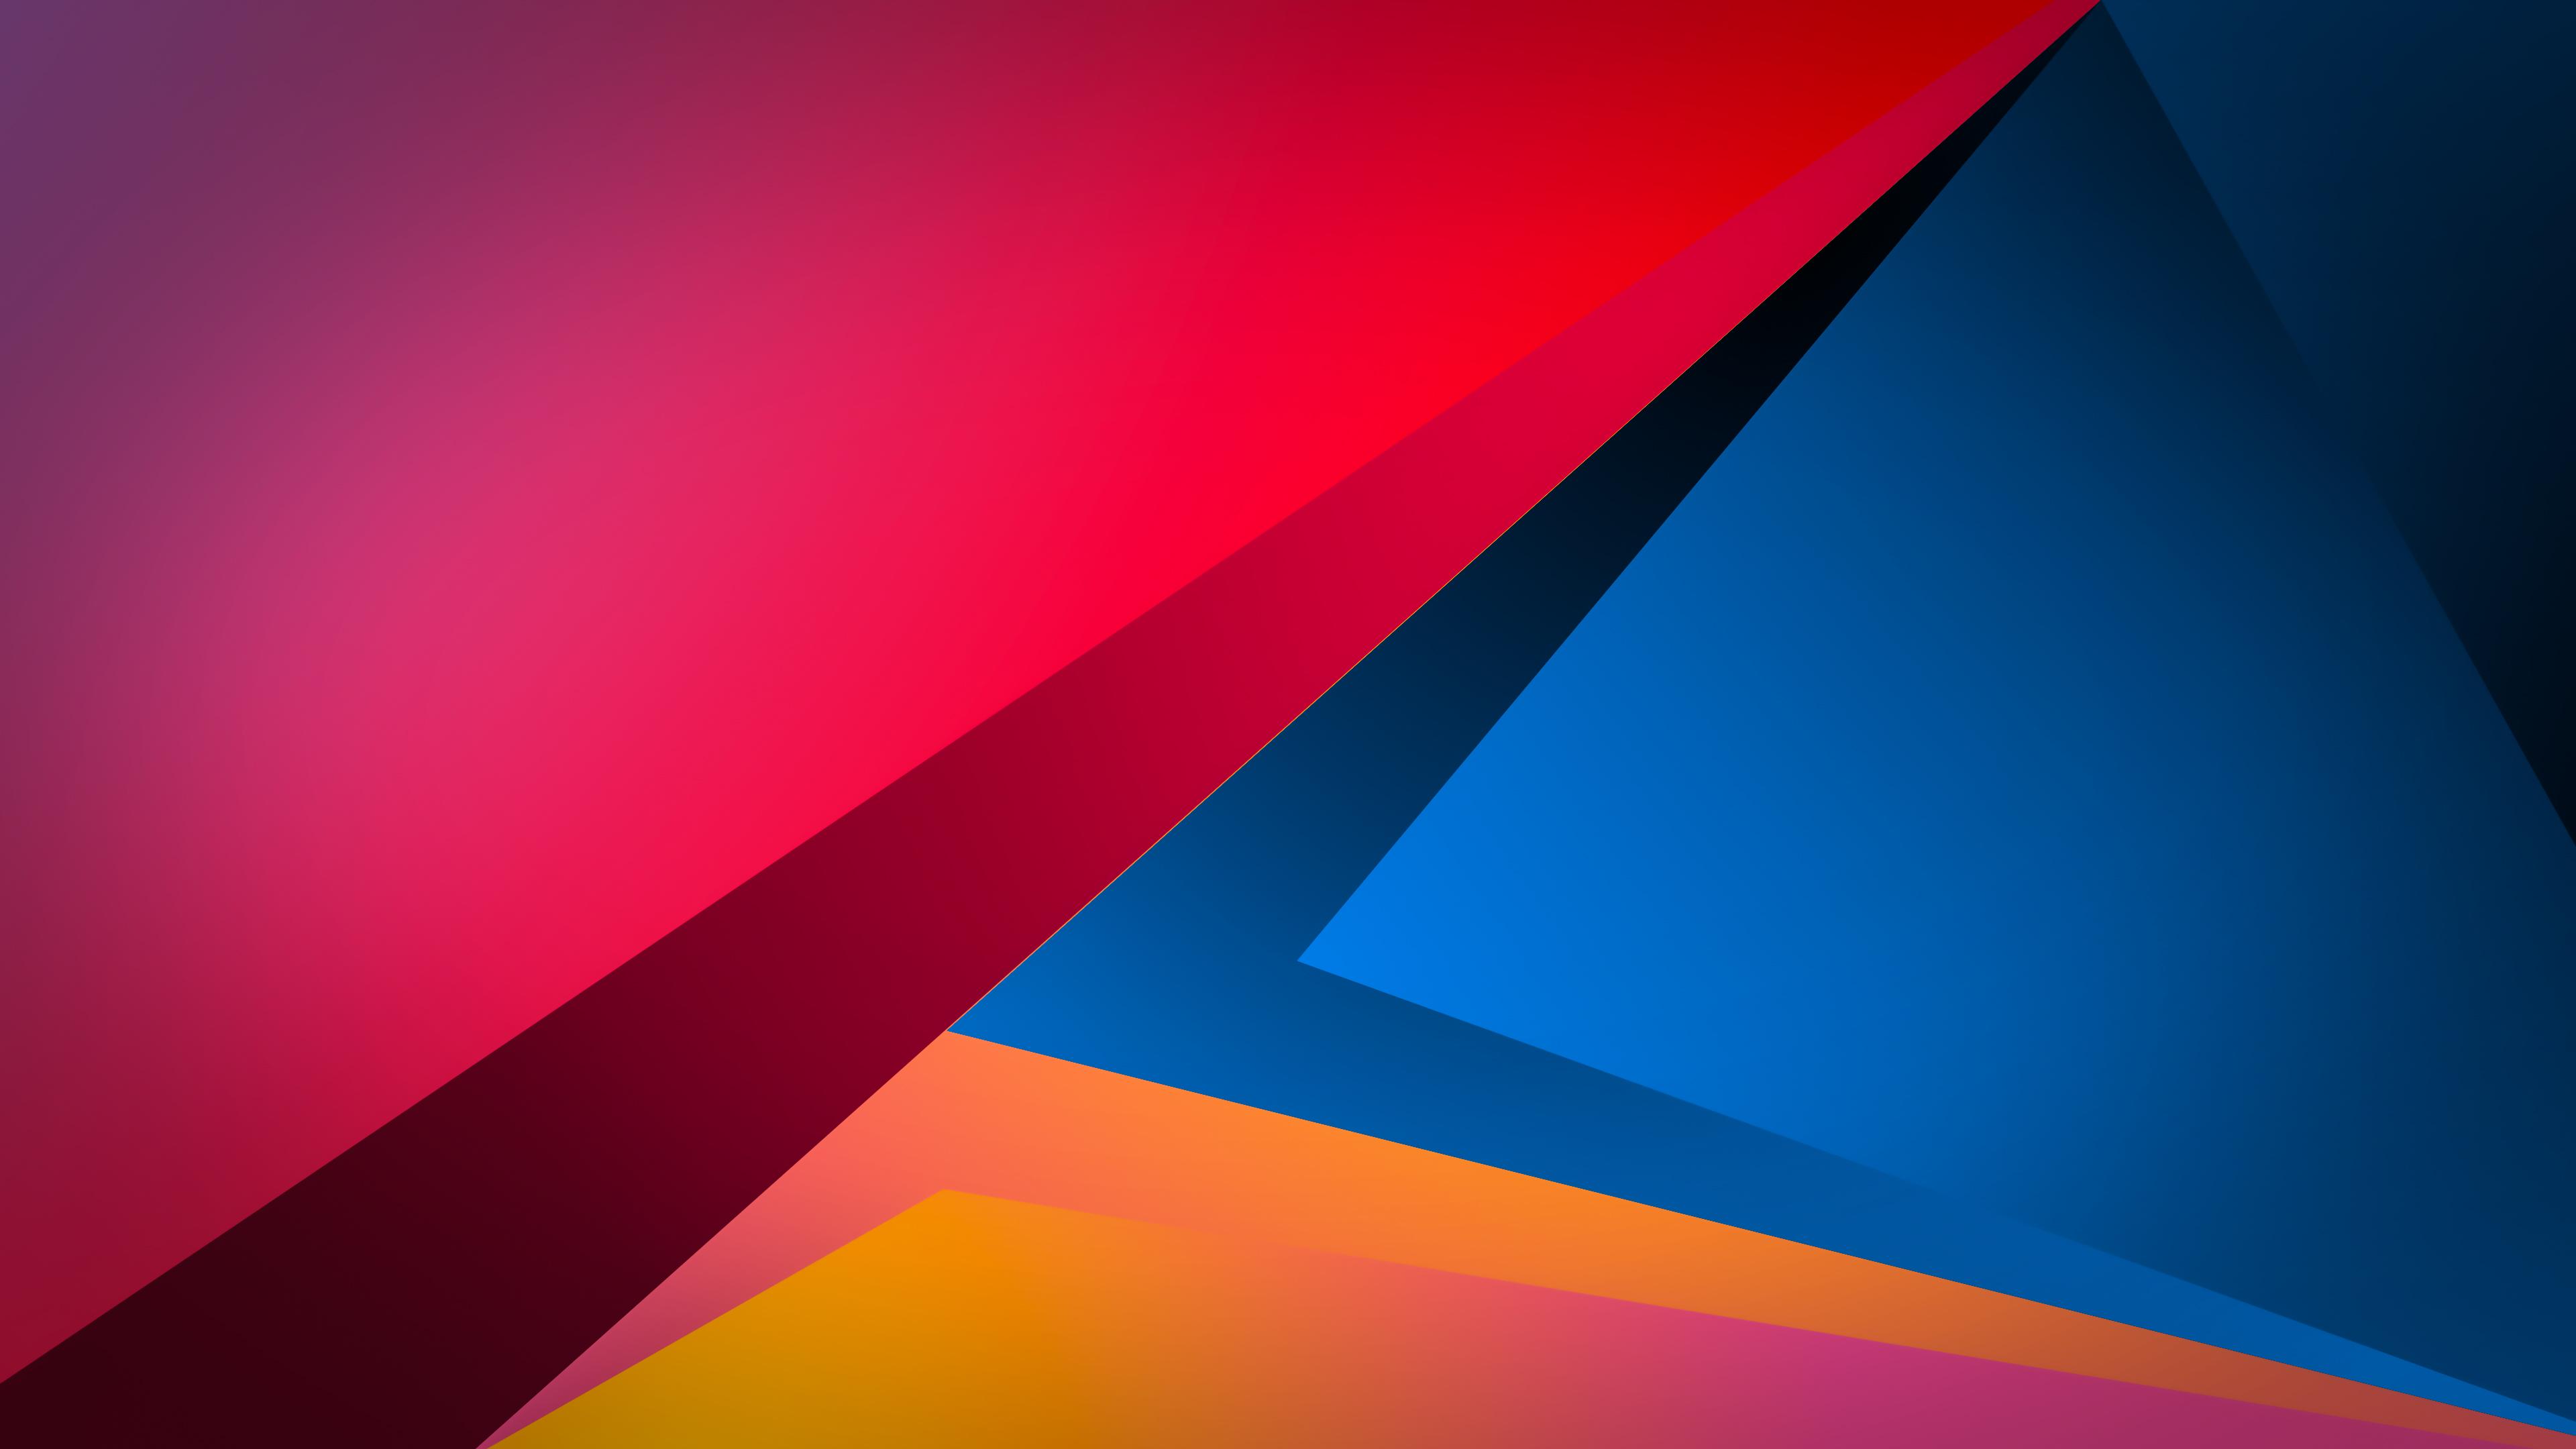 minimal shapes sharp 4k 1602438456 - Minimal Shapes Sharp 4k - Minimal Shapes Sharp 4k wallpapers